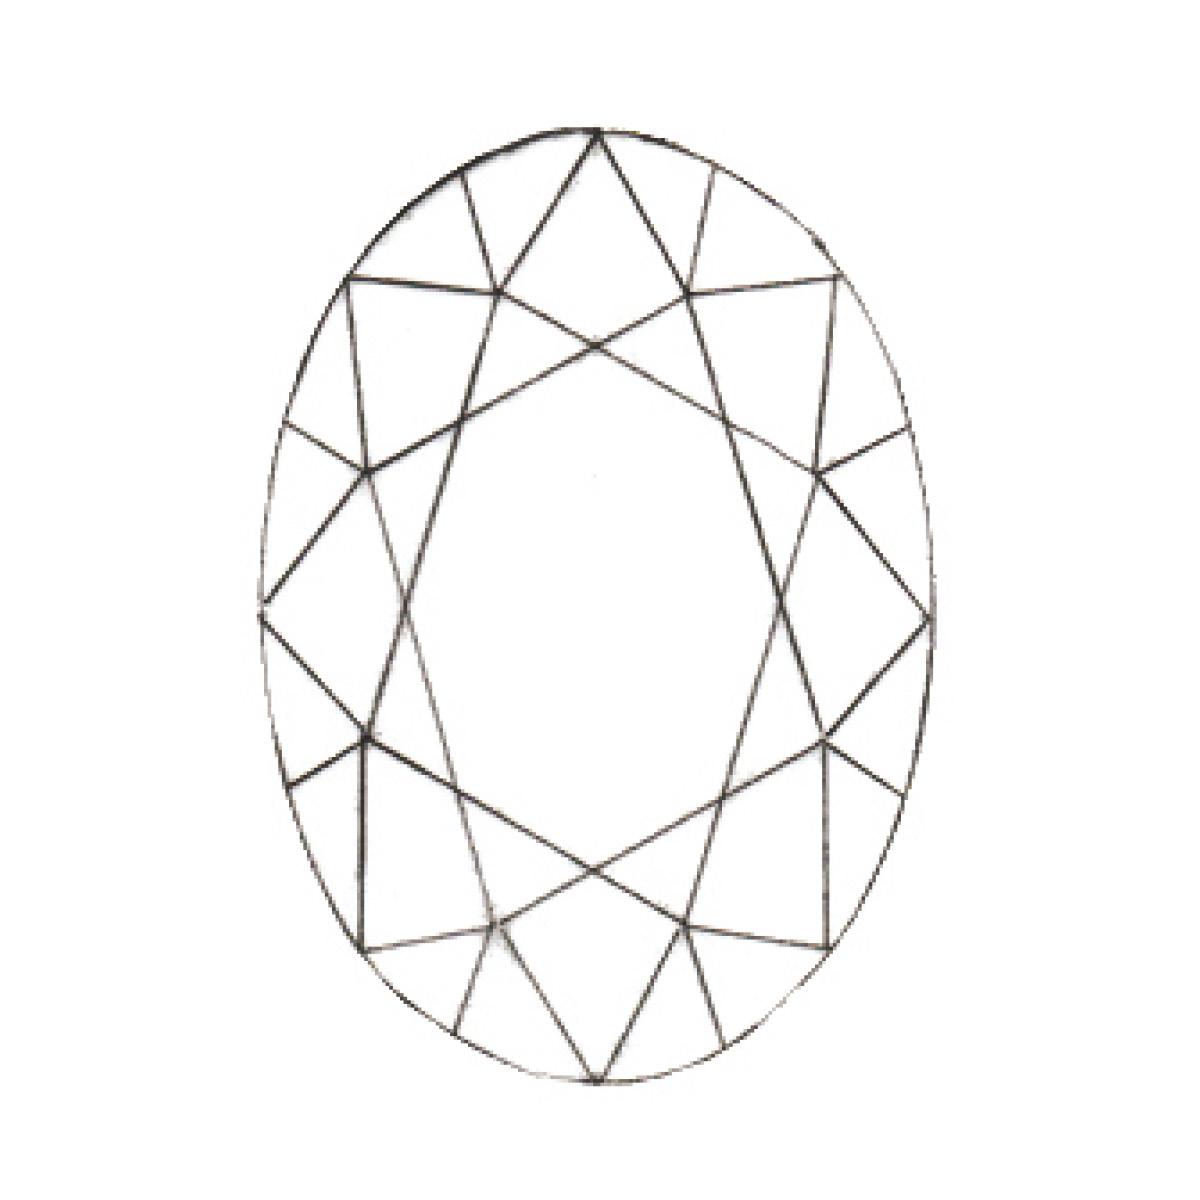 1200x1200 Diamond Cuts Amp Shapes De Beers